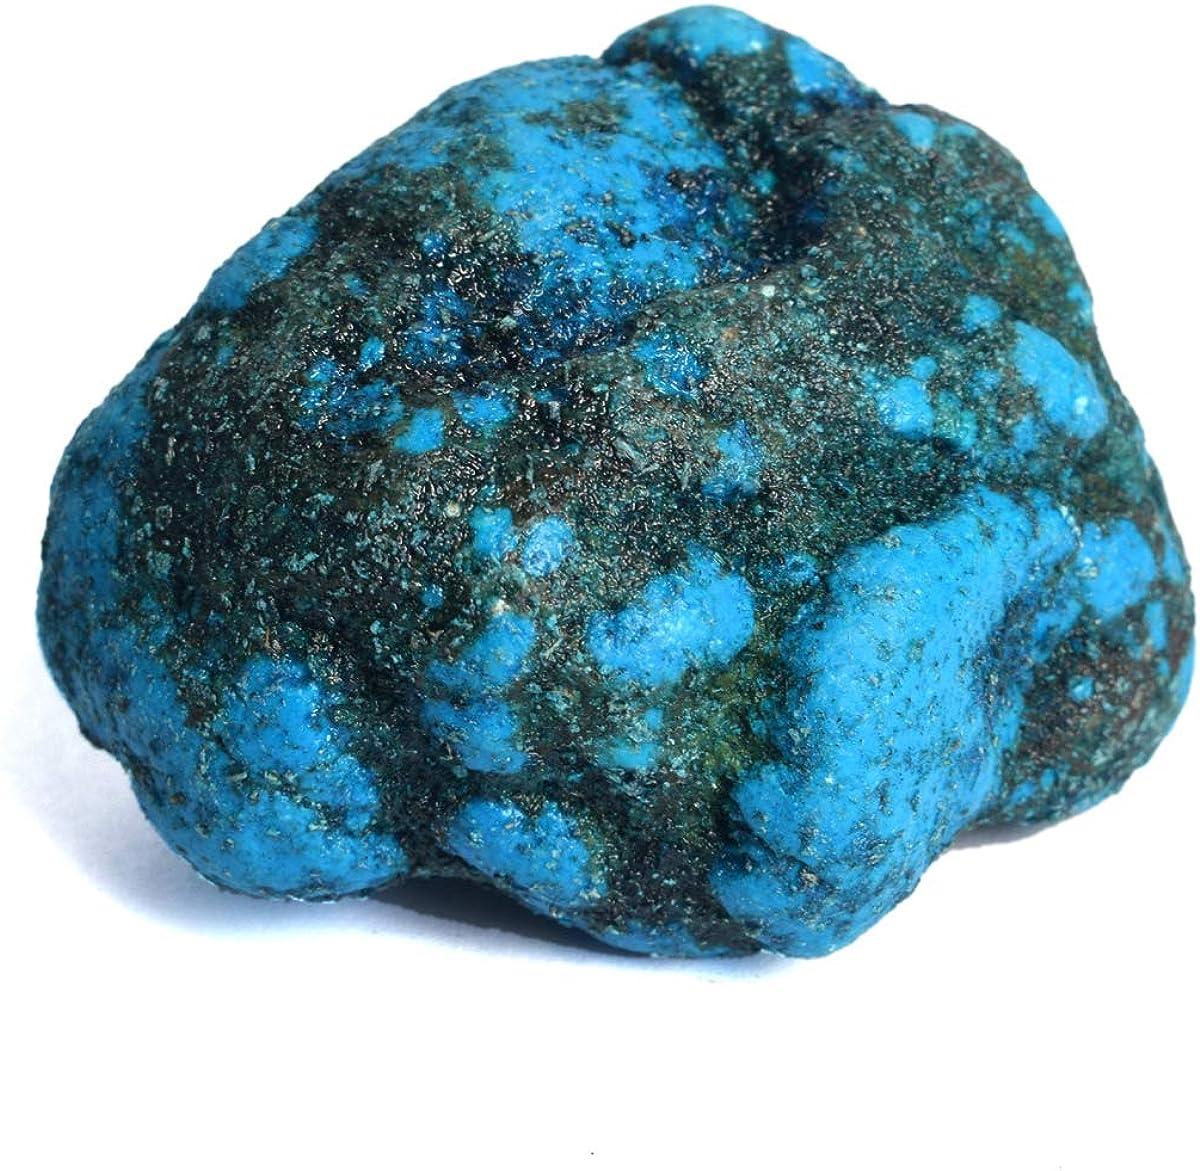 Natural Blue Turquoise Rough Gemstone 8.50 Ct EGL Certified Rare Wonderful Raw Turquoise Stone